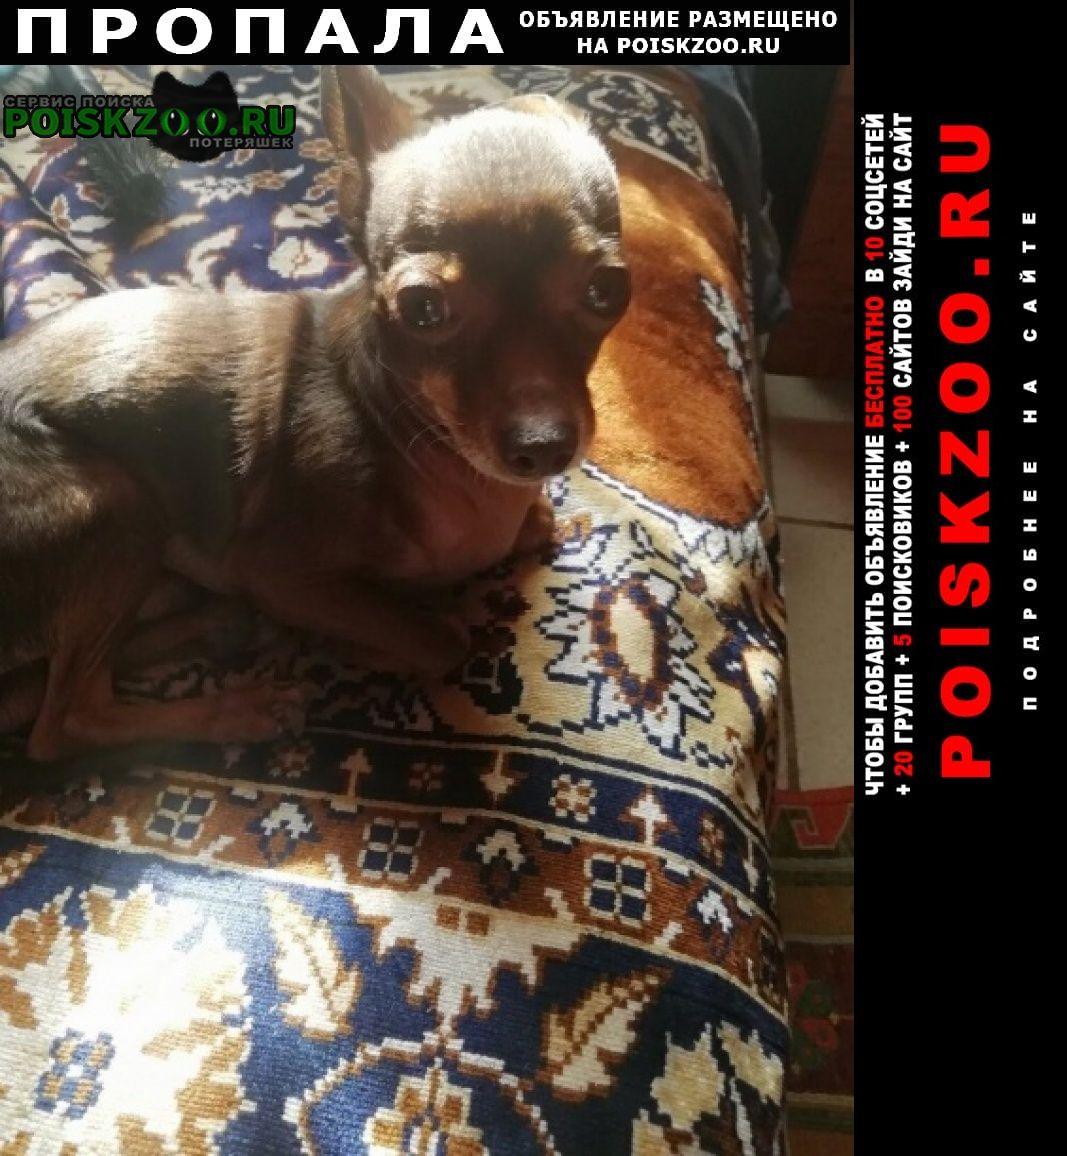 Пропала собака по дороге нуримановского района Уфа